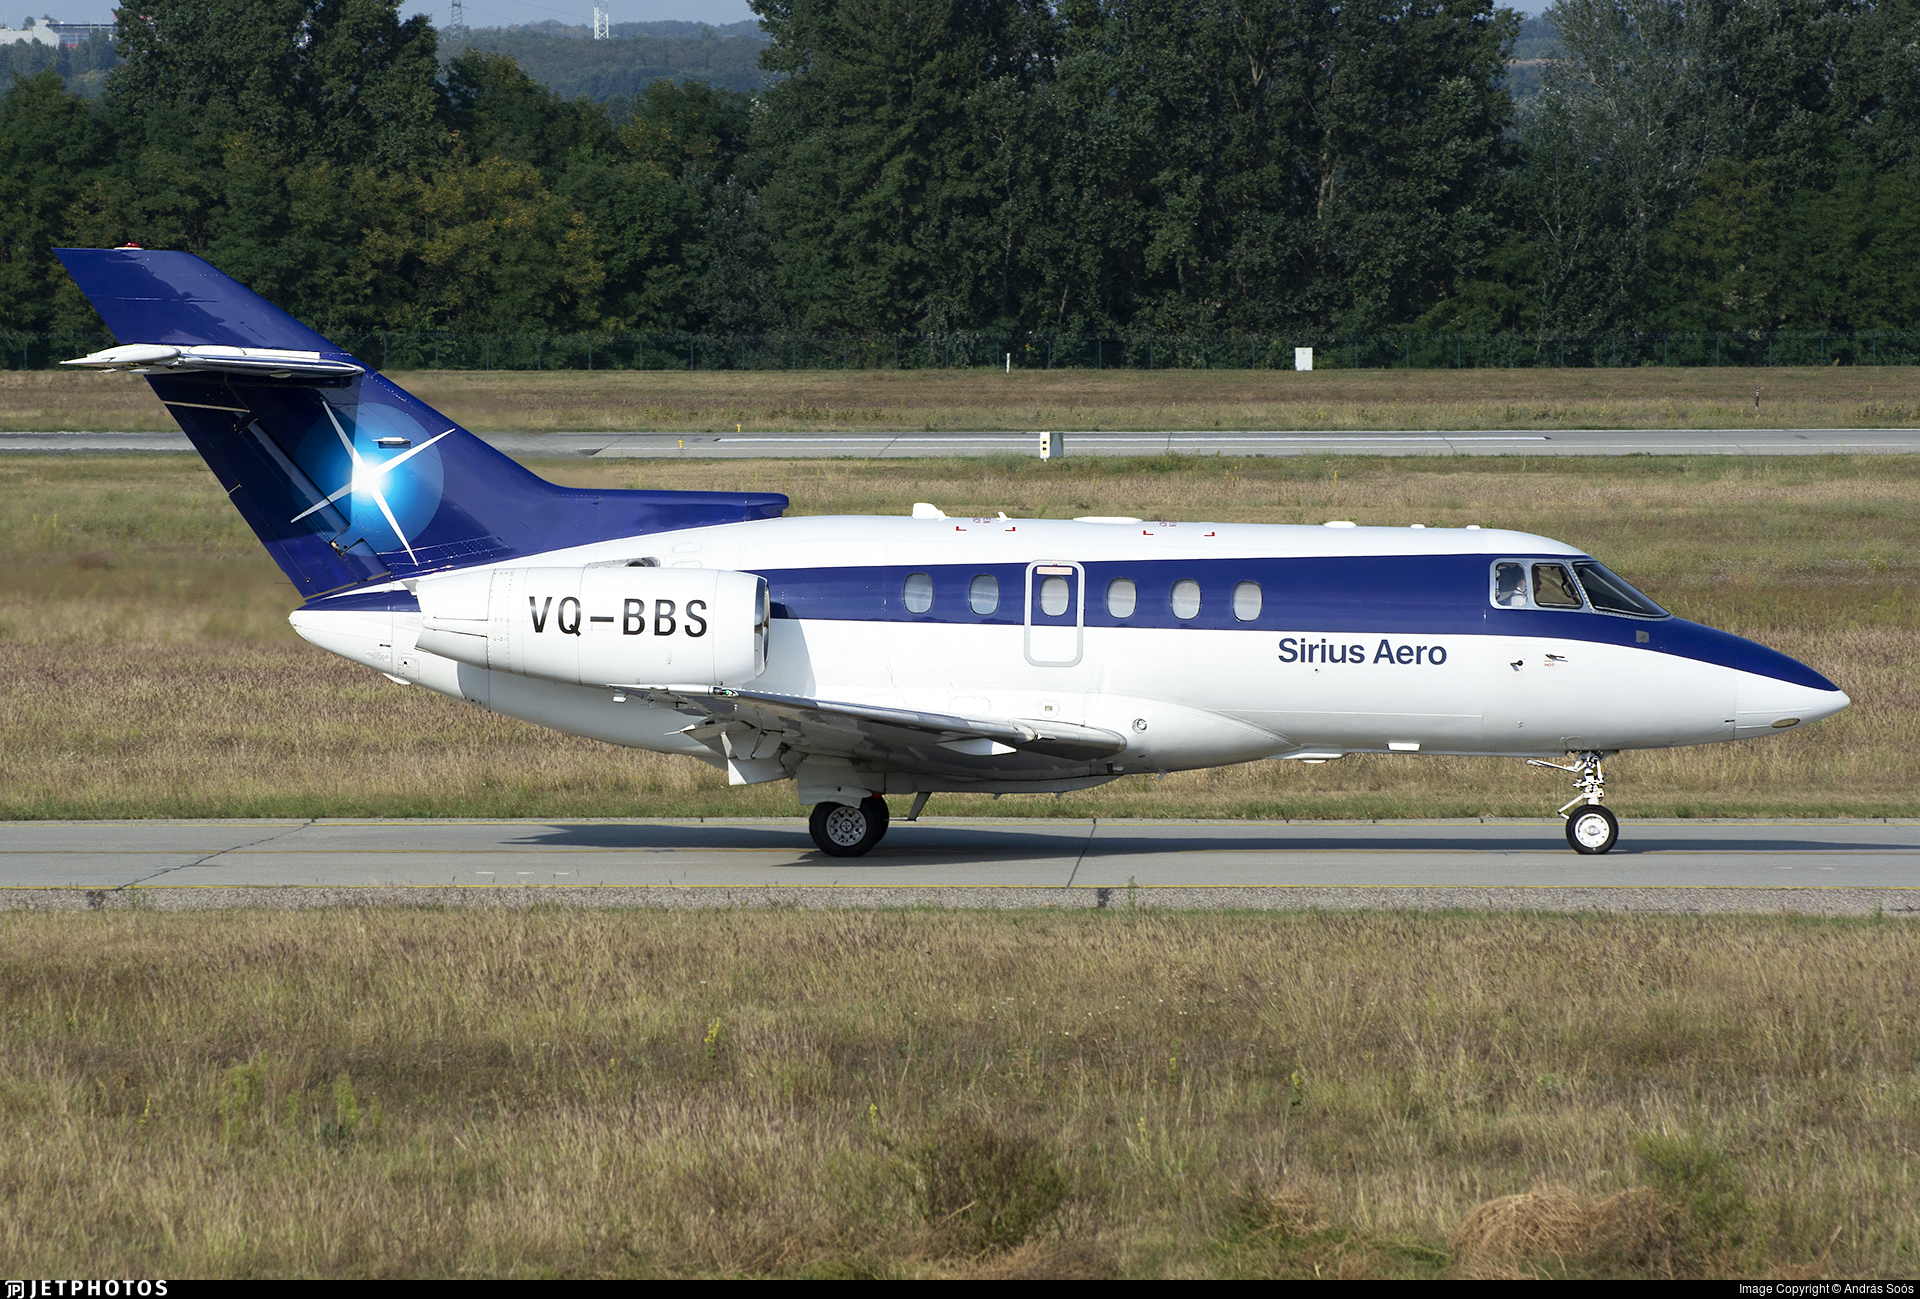 VQ-BBS - Raytheon Hawker 750 - Sirius Aero